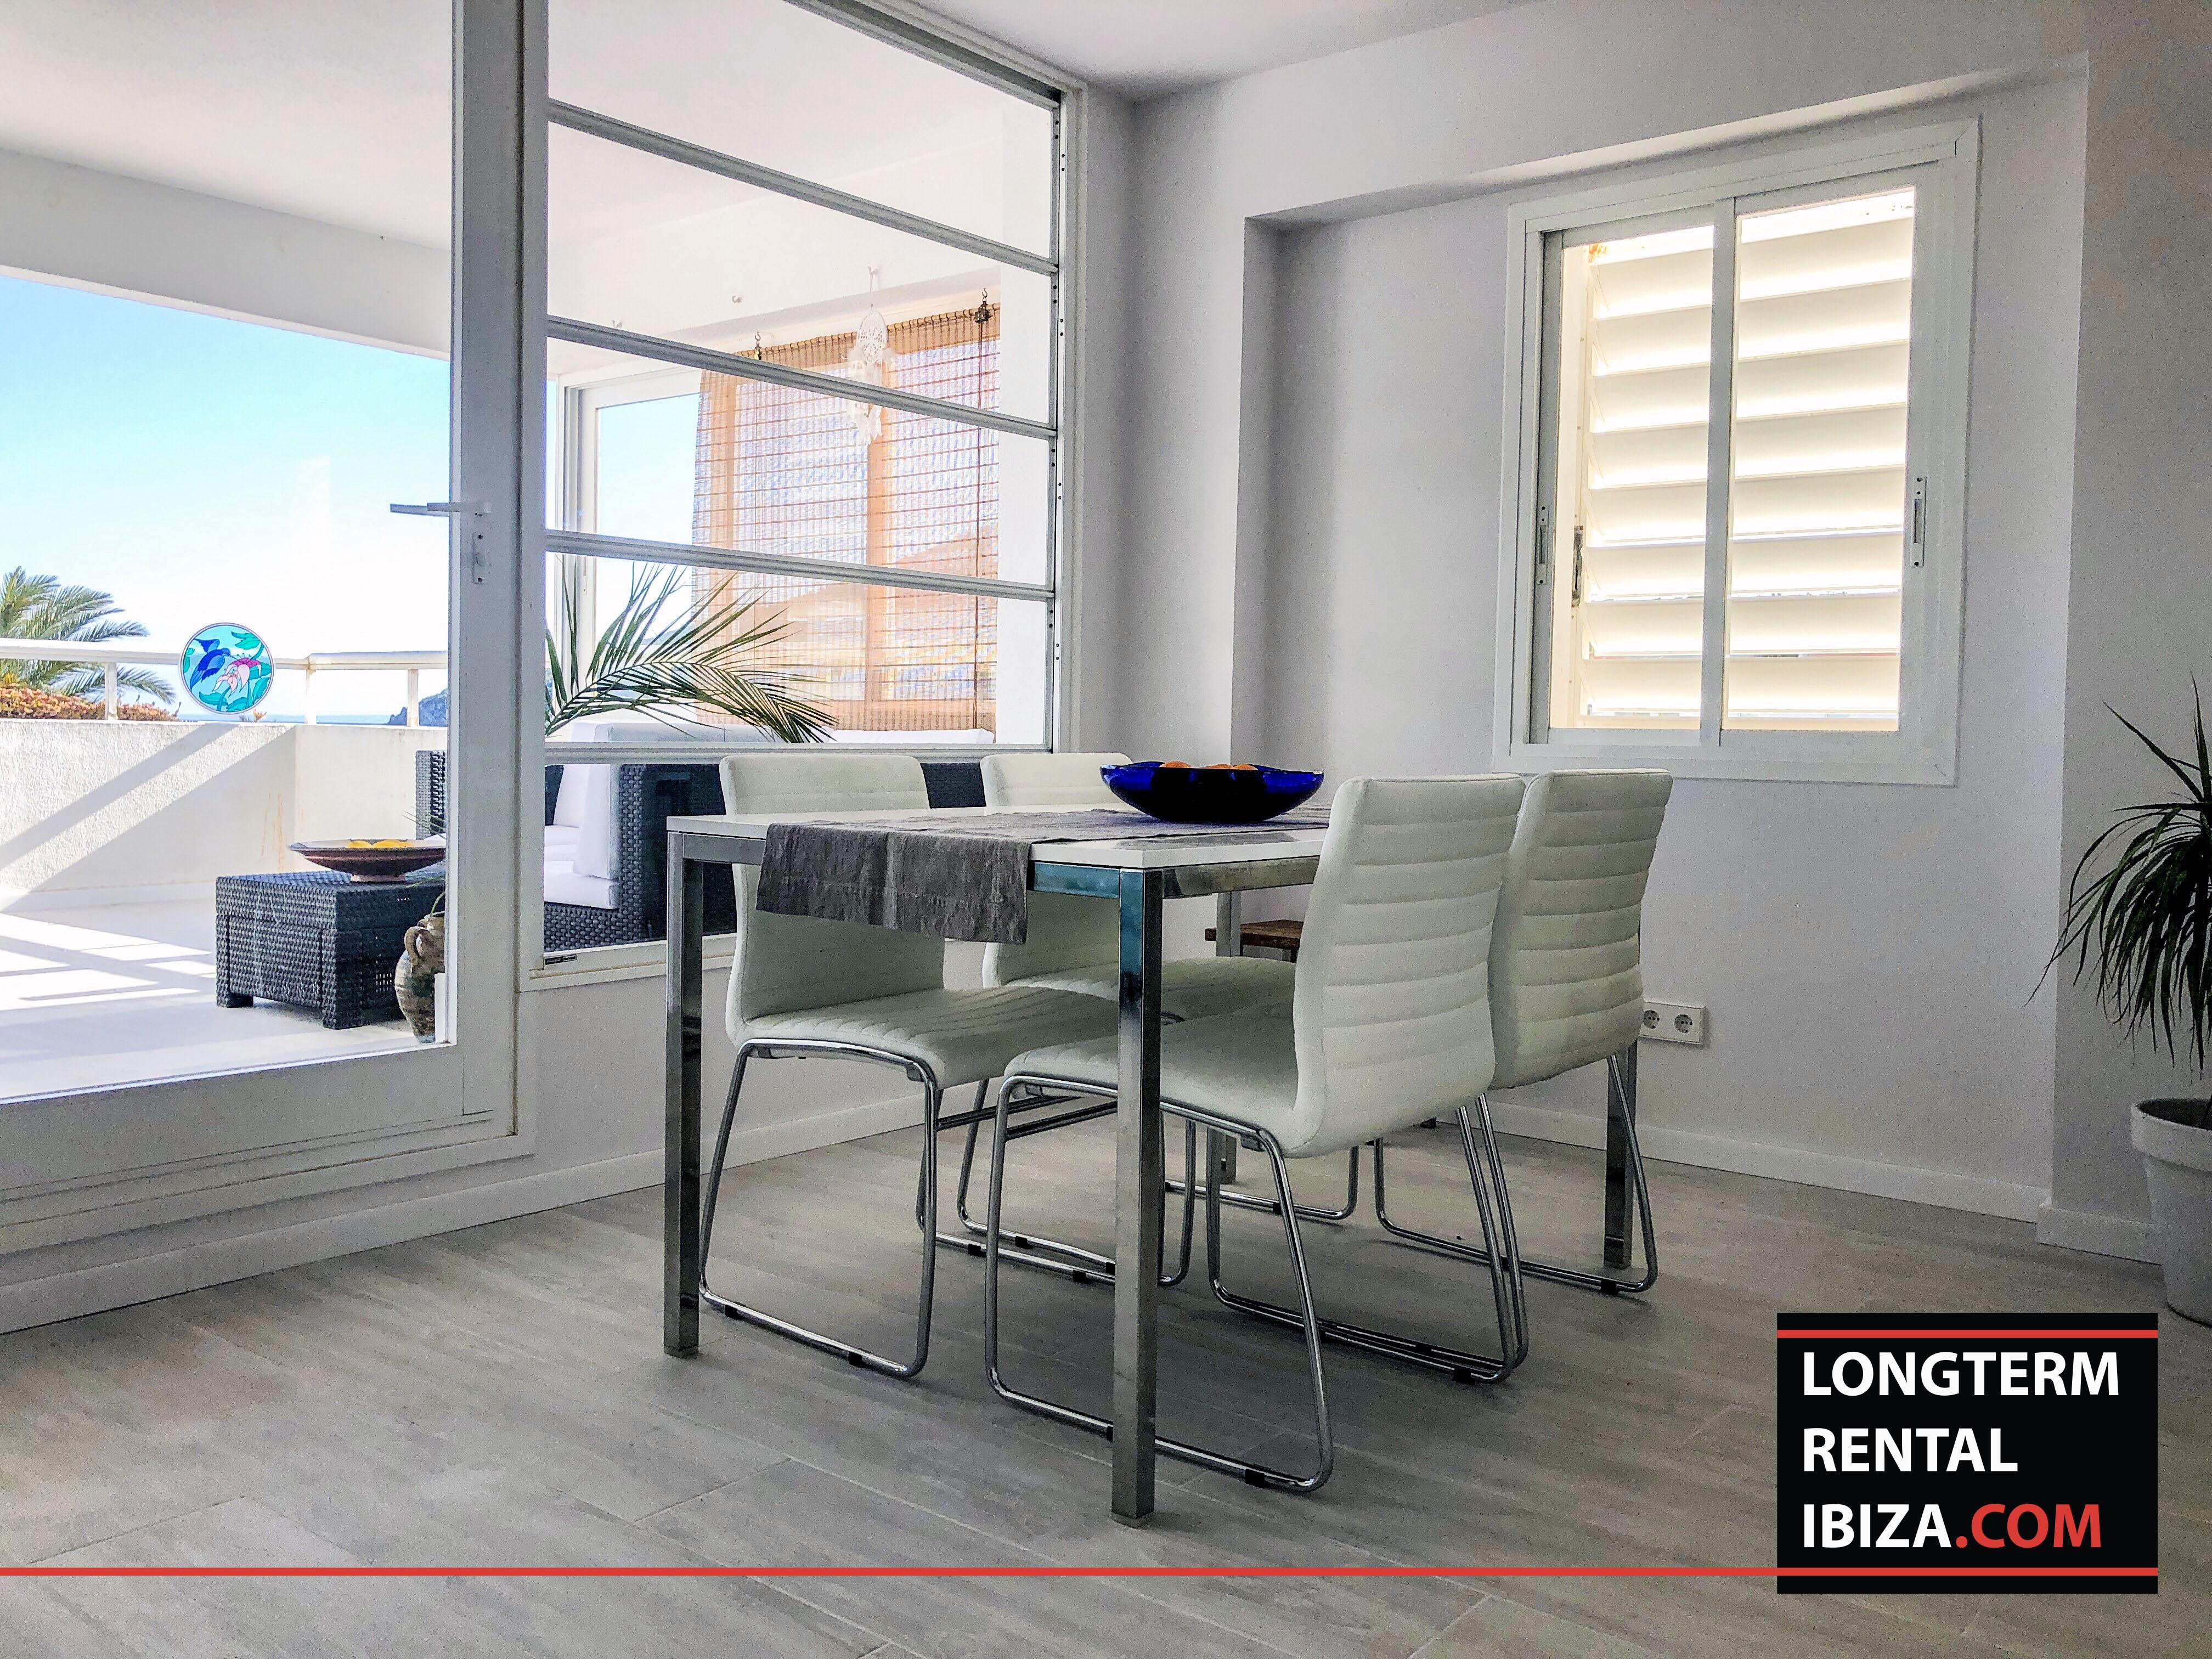 Apartment Boulevard - Long term rental IbizaLong term ...